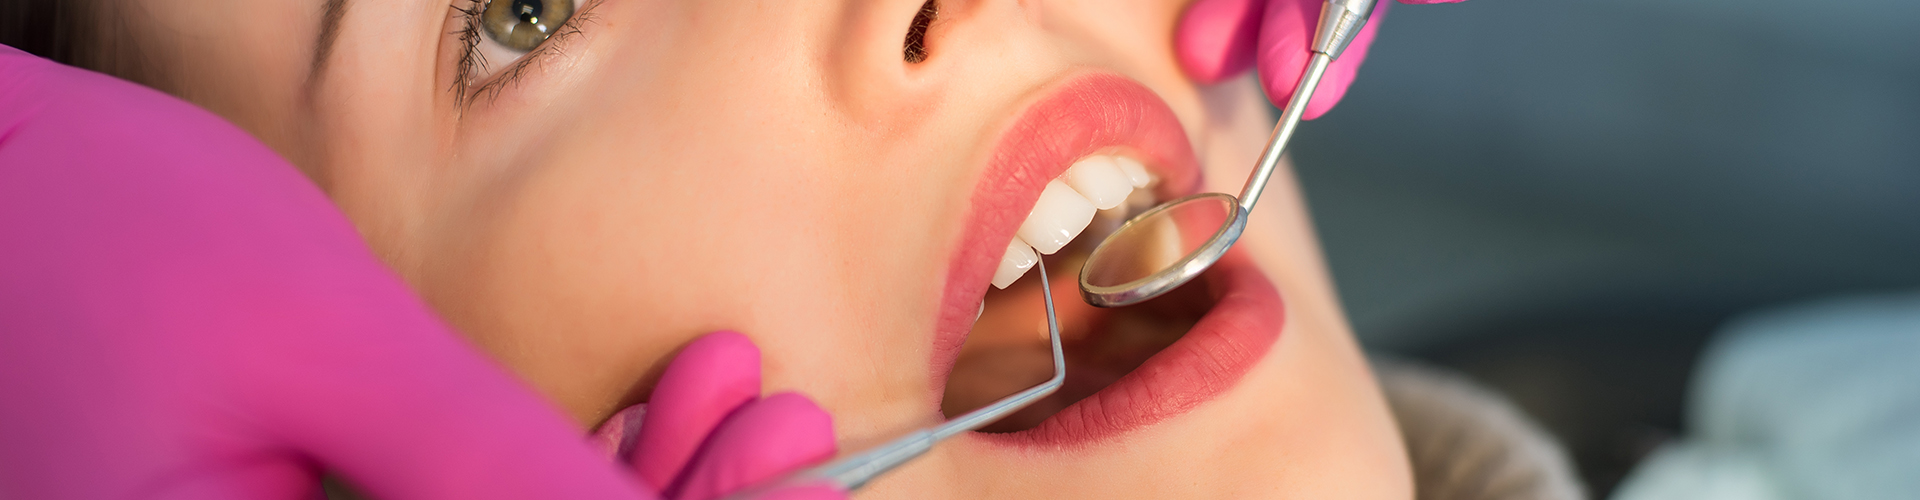 Nervous Dental Patients | Shine Dental Clinic Ashton | Shine Dental Clinic Ripponden